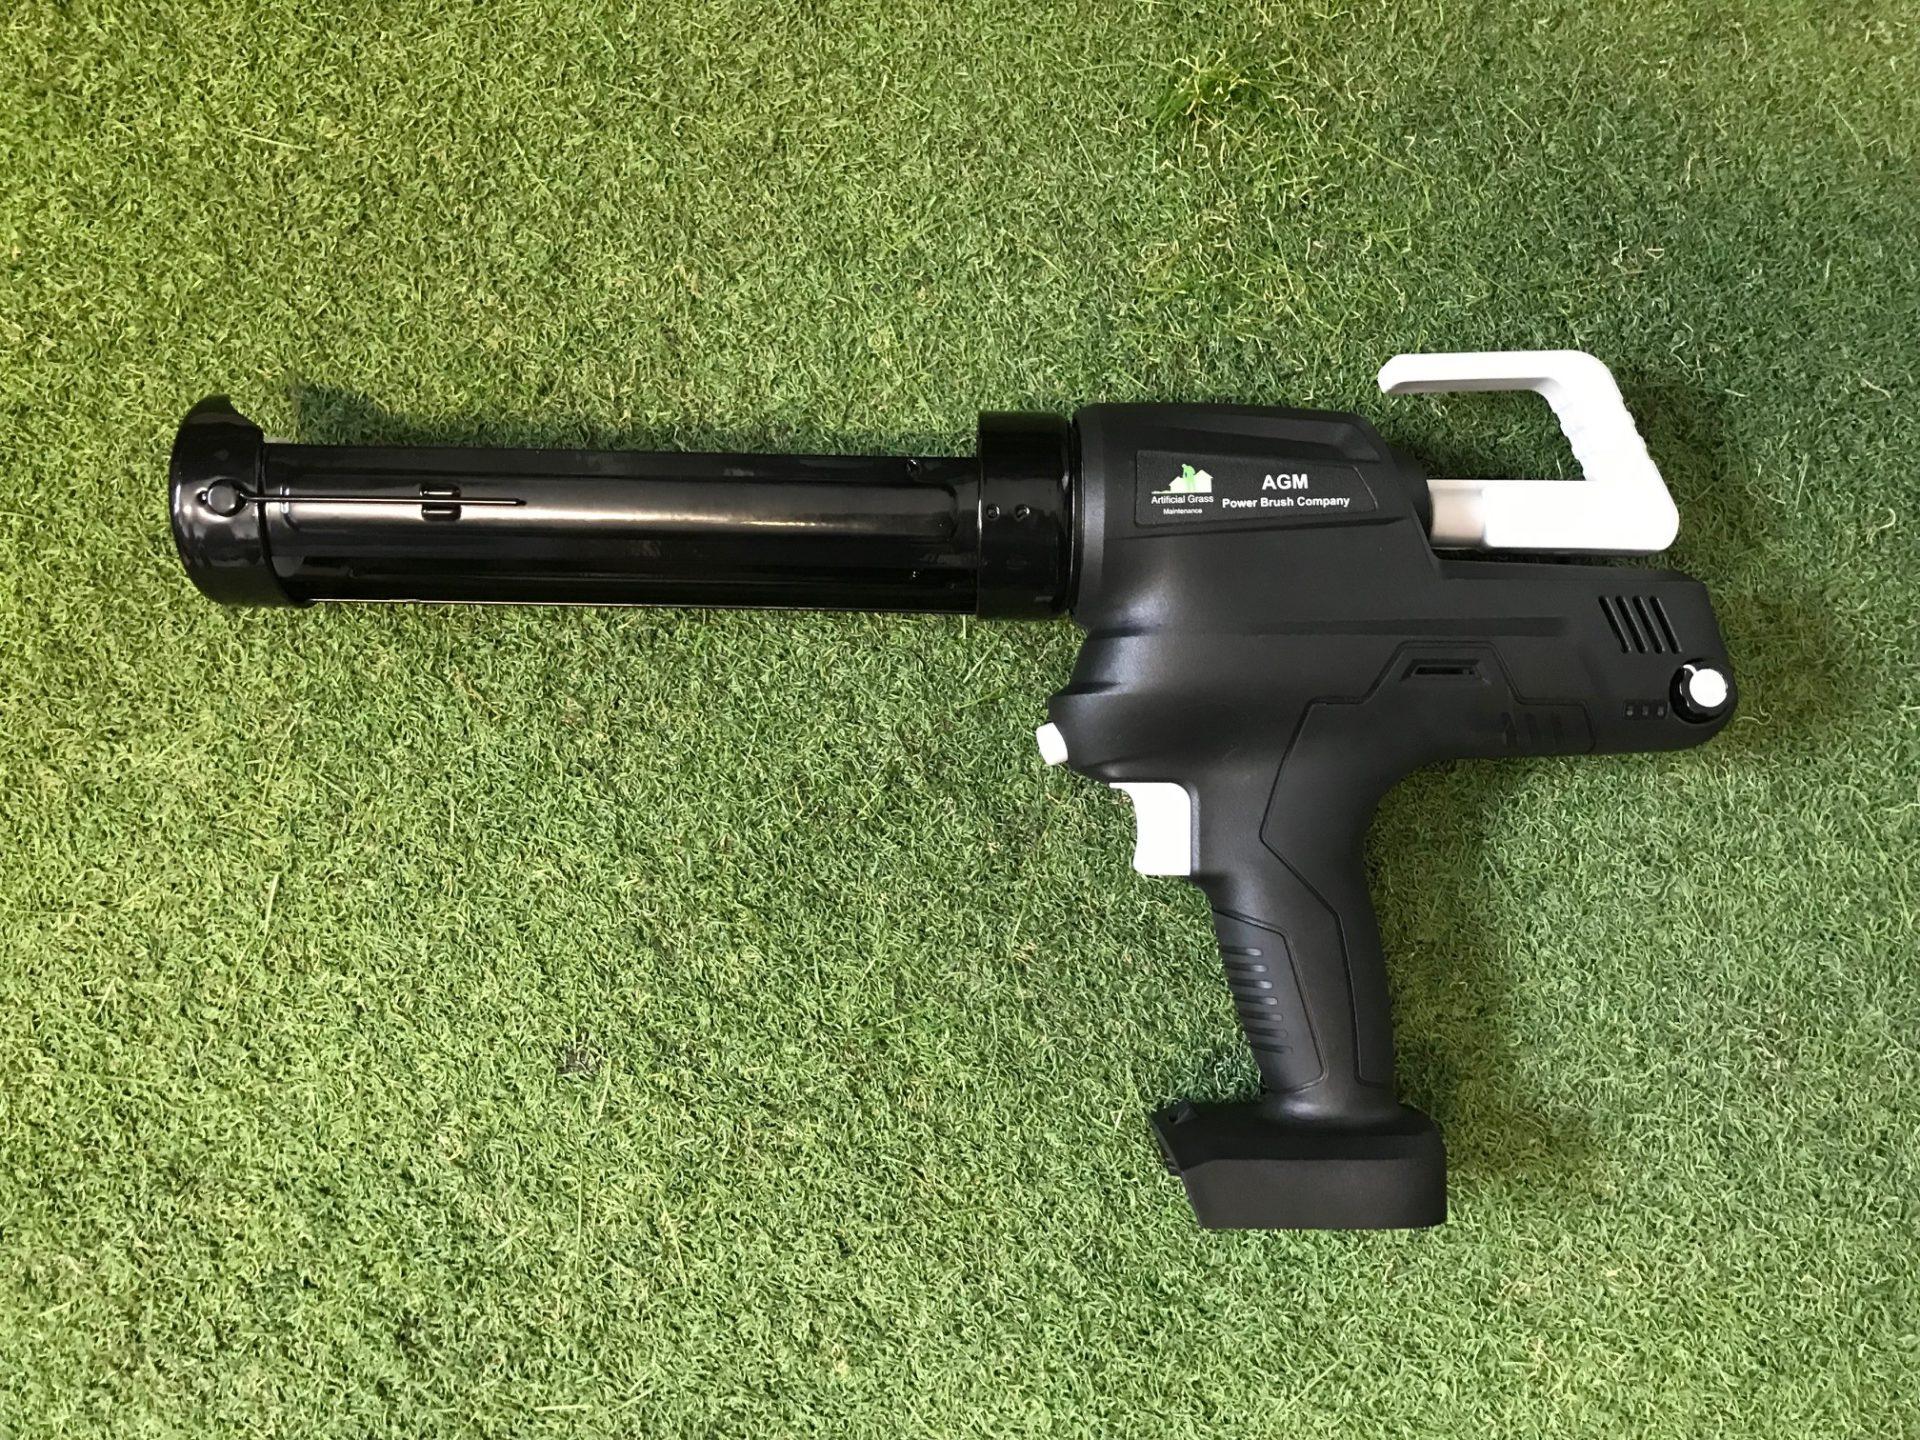 Cordless Caulking/Sealant Gun